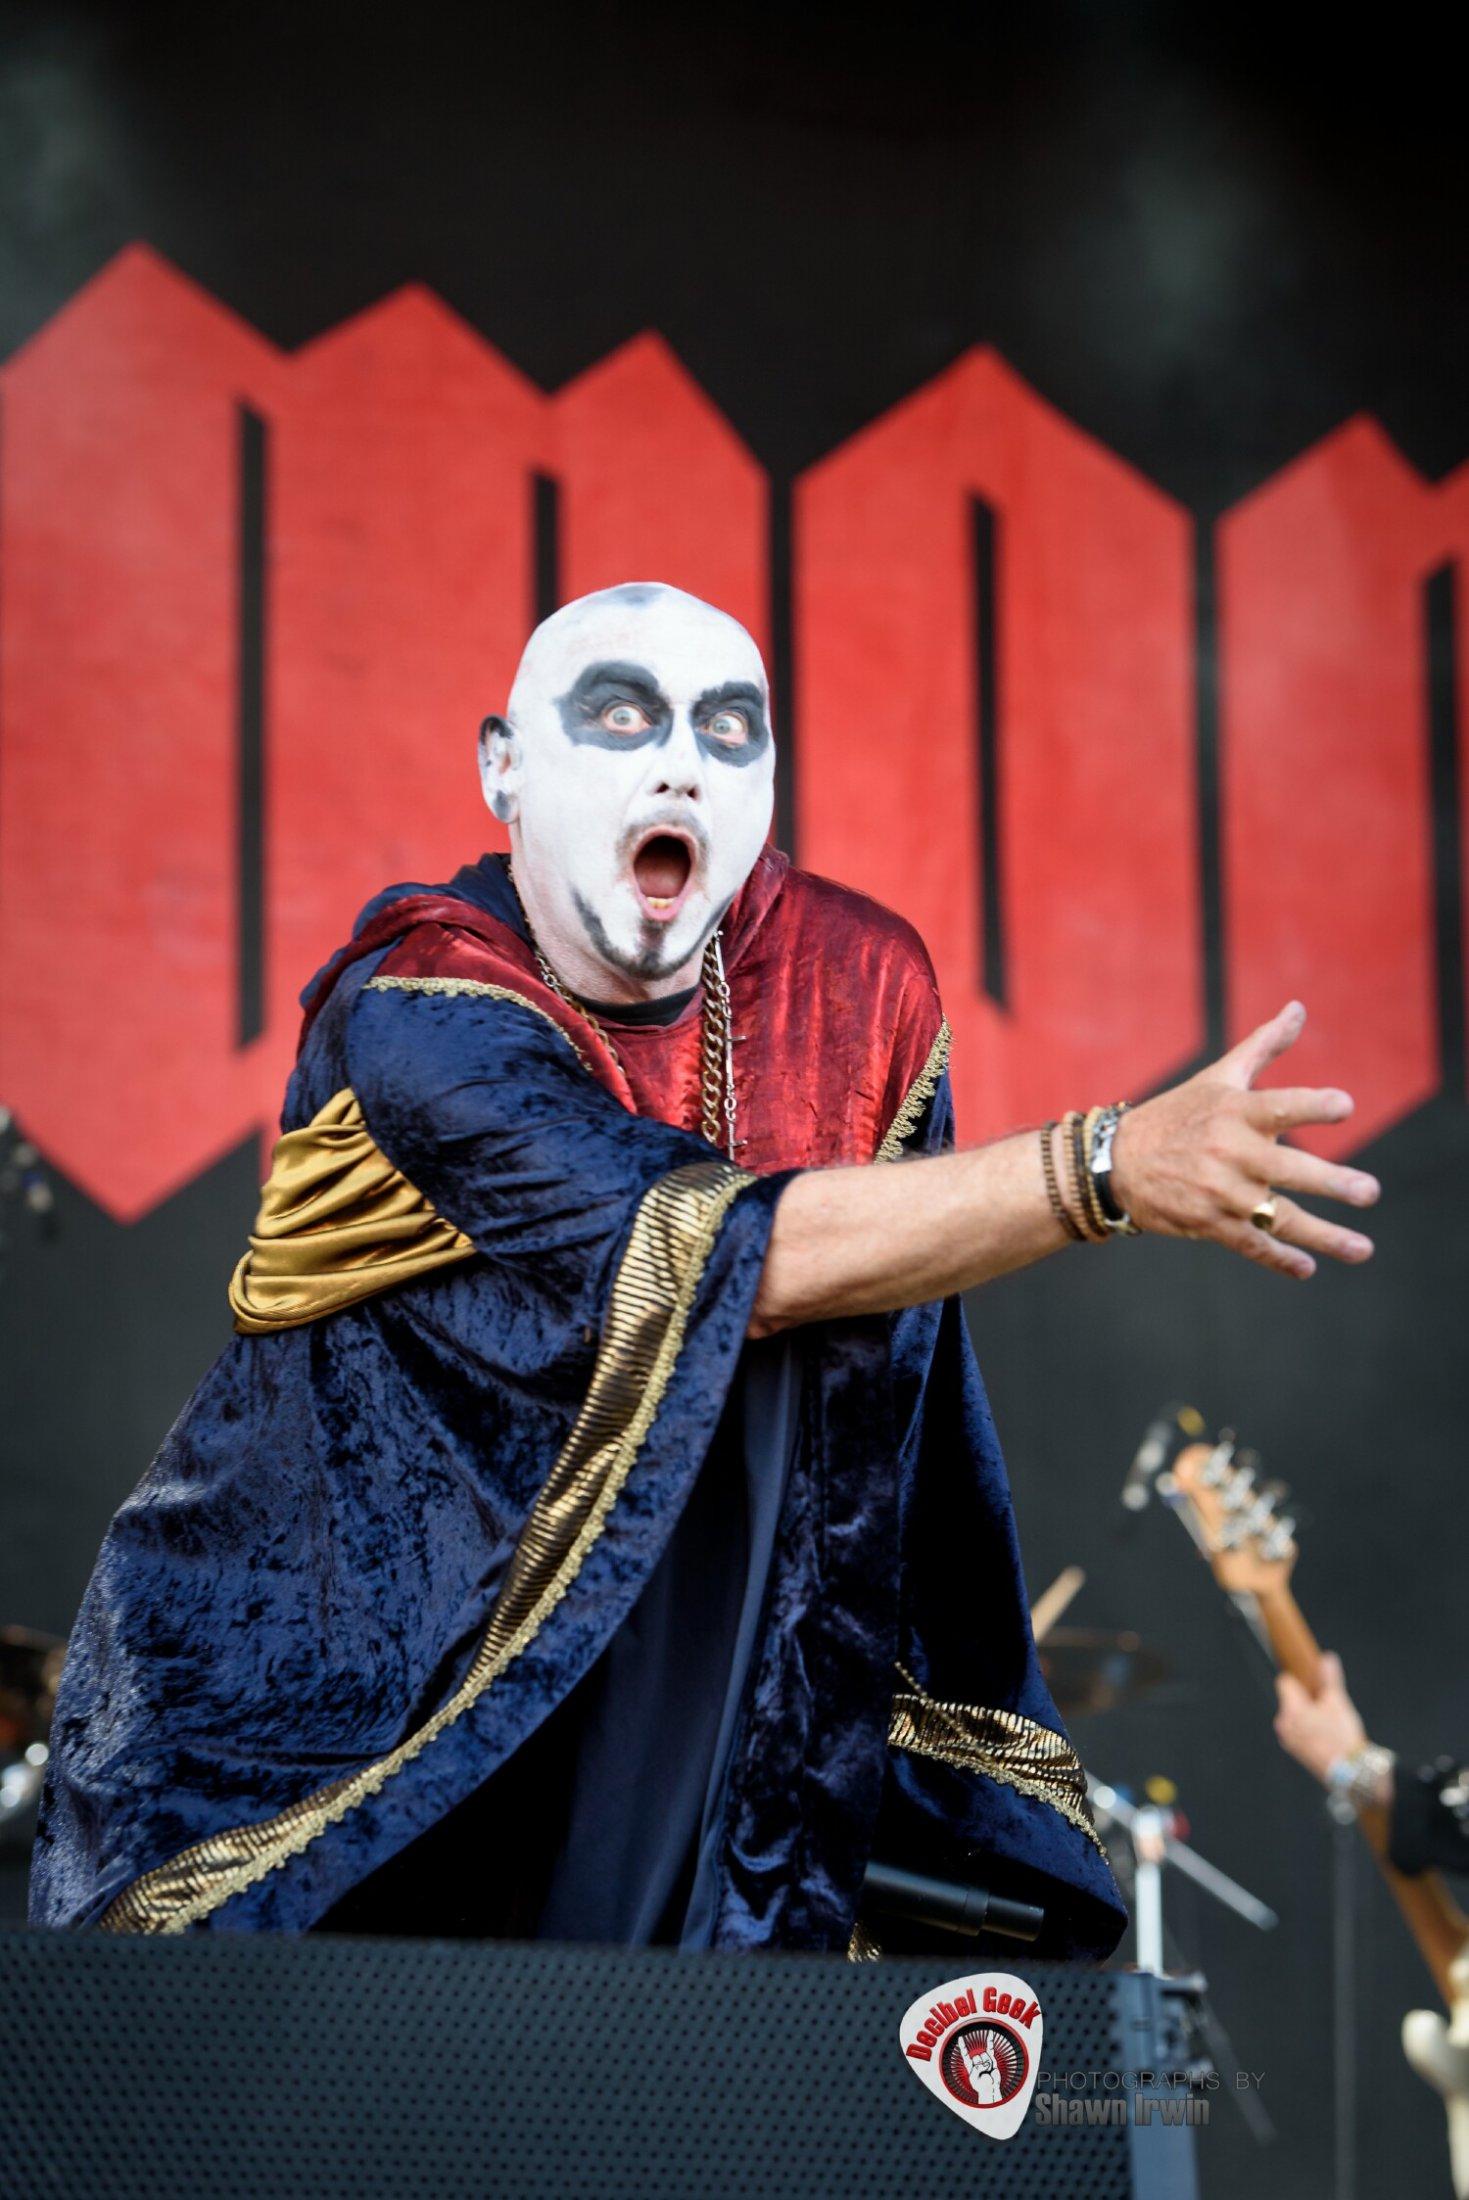 Demon #37-Sweden Rock 2019-Shawn Irwin